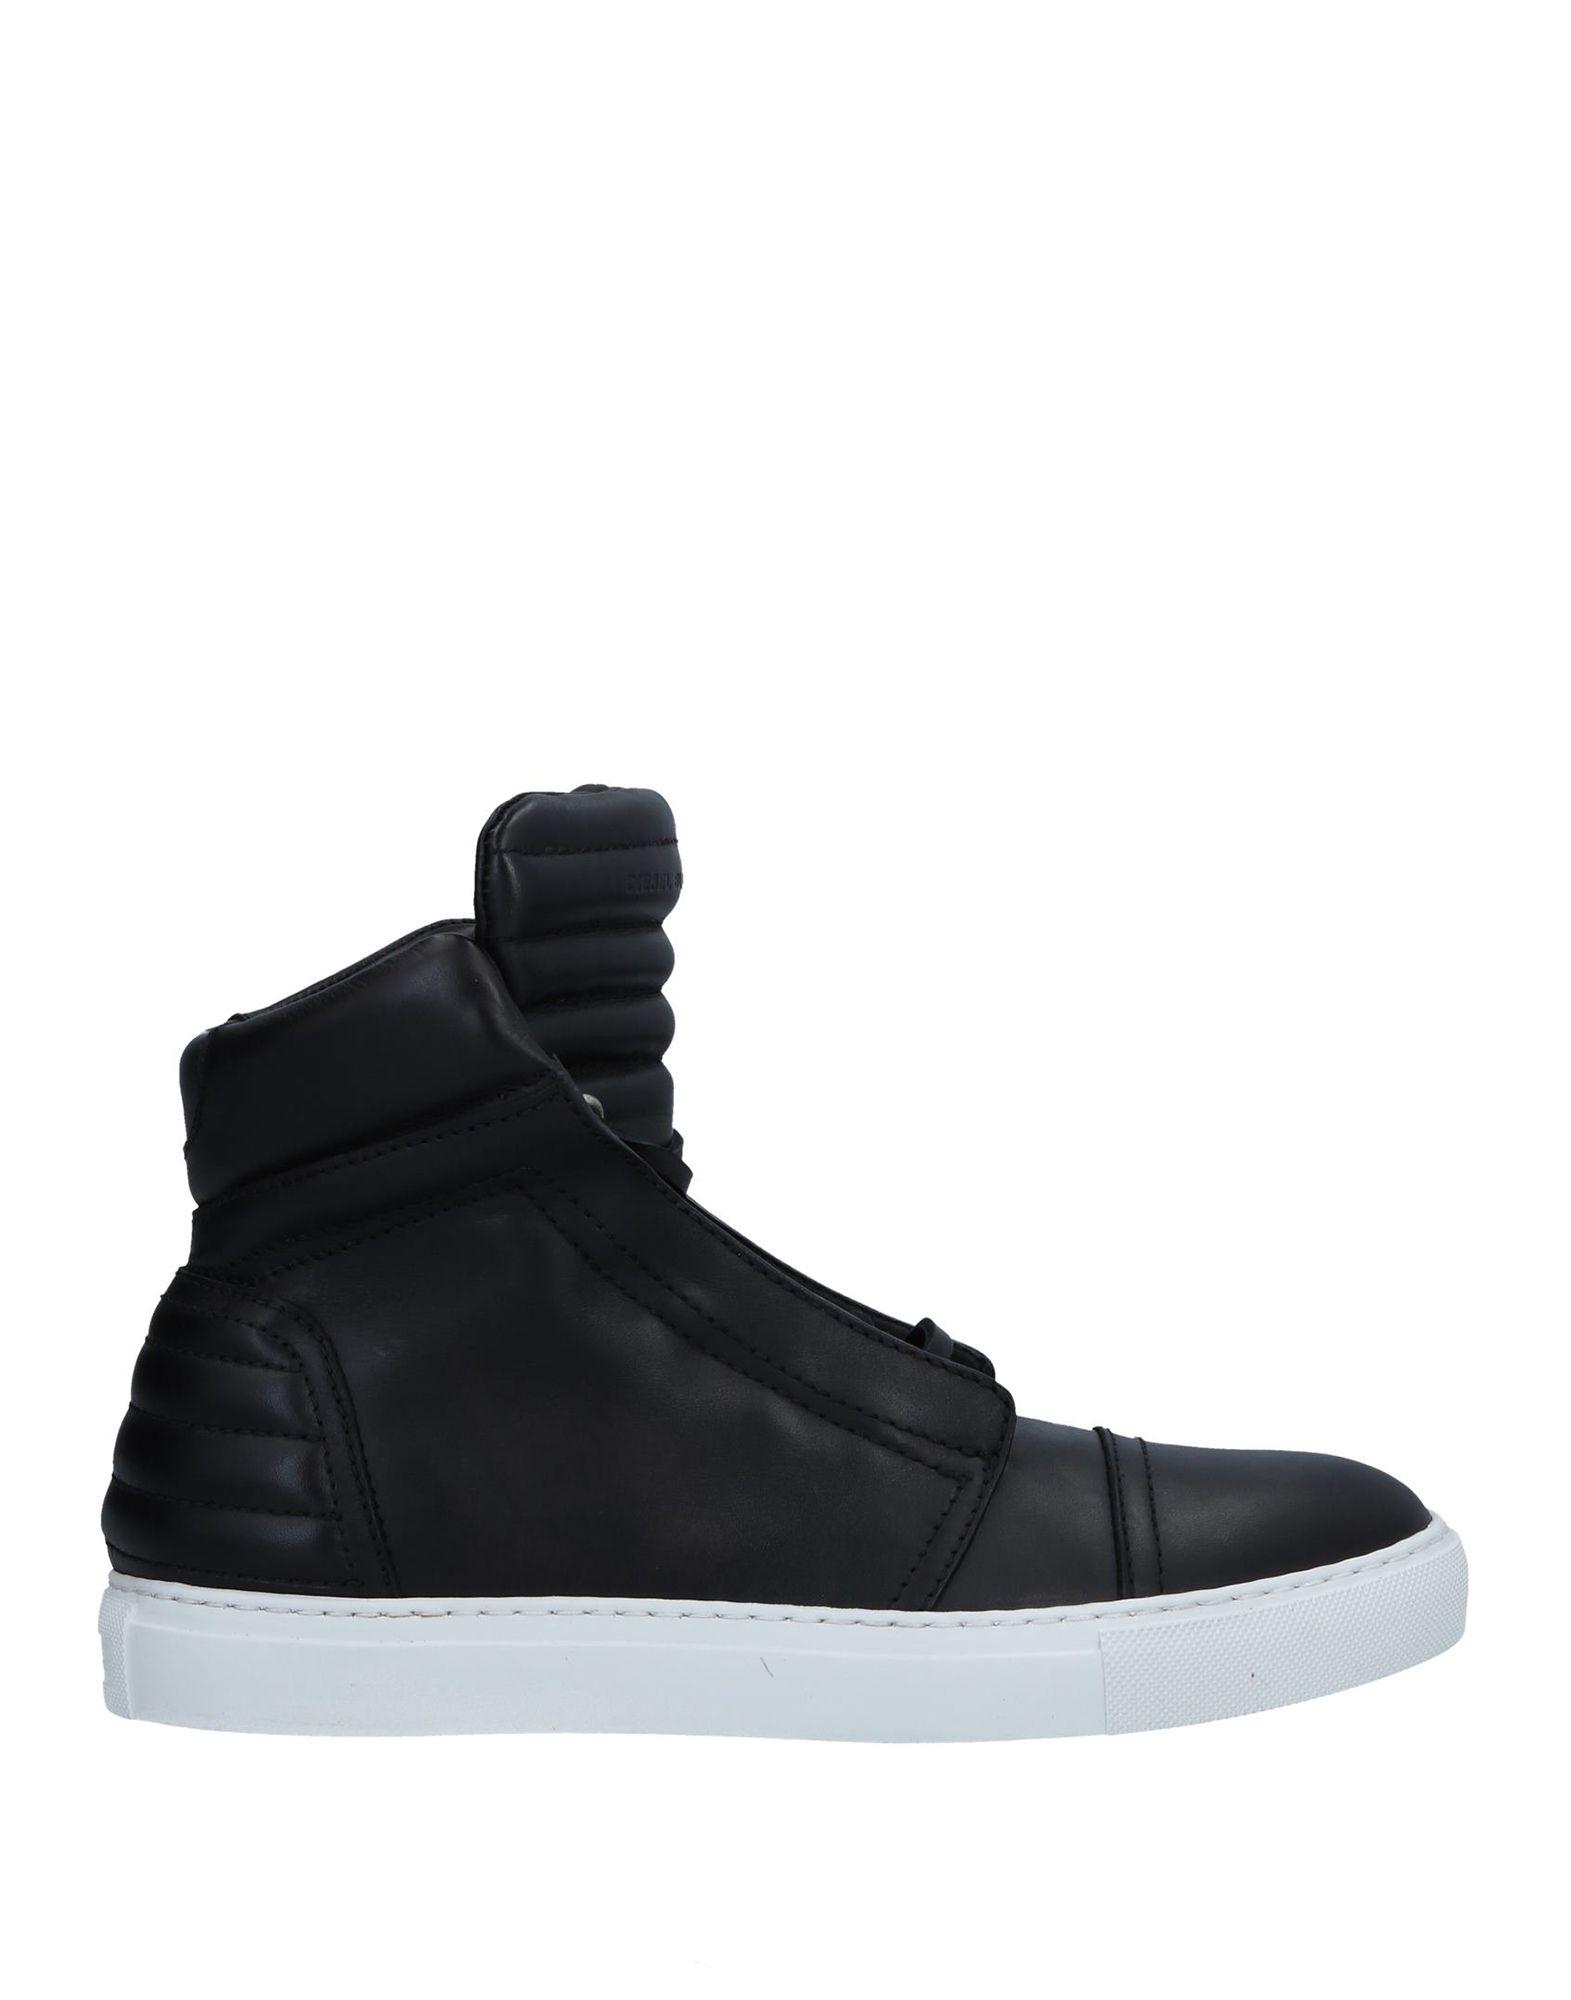 Sneakers Diesel Black Gold Donna - 11532731OH